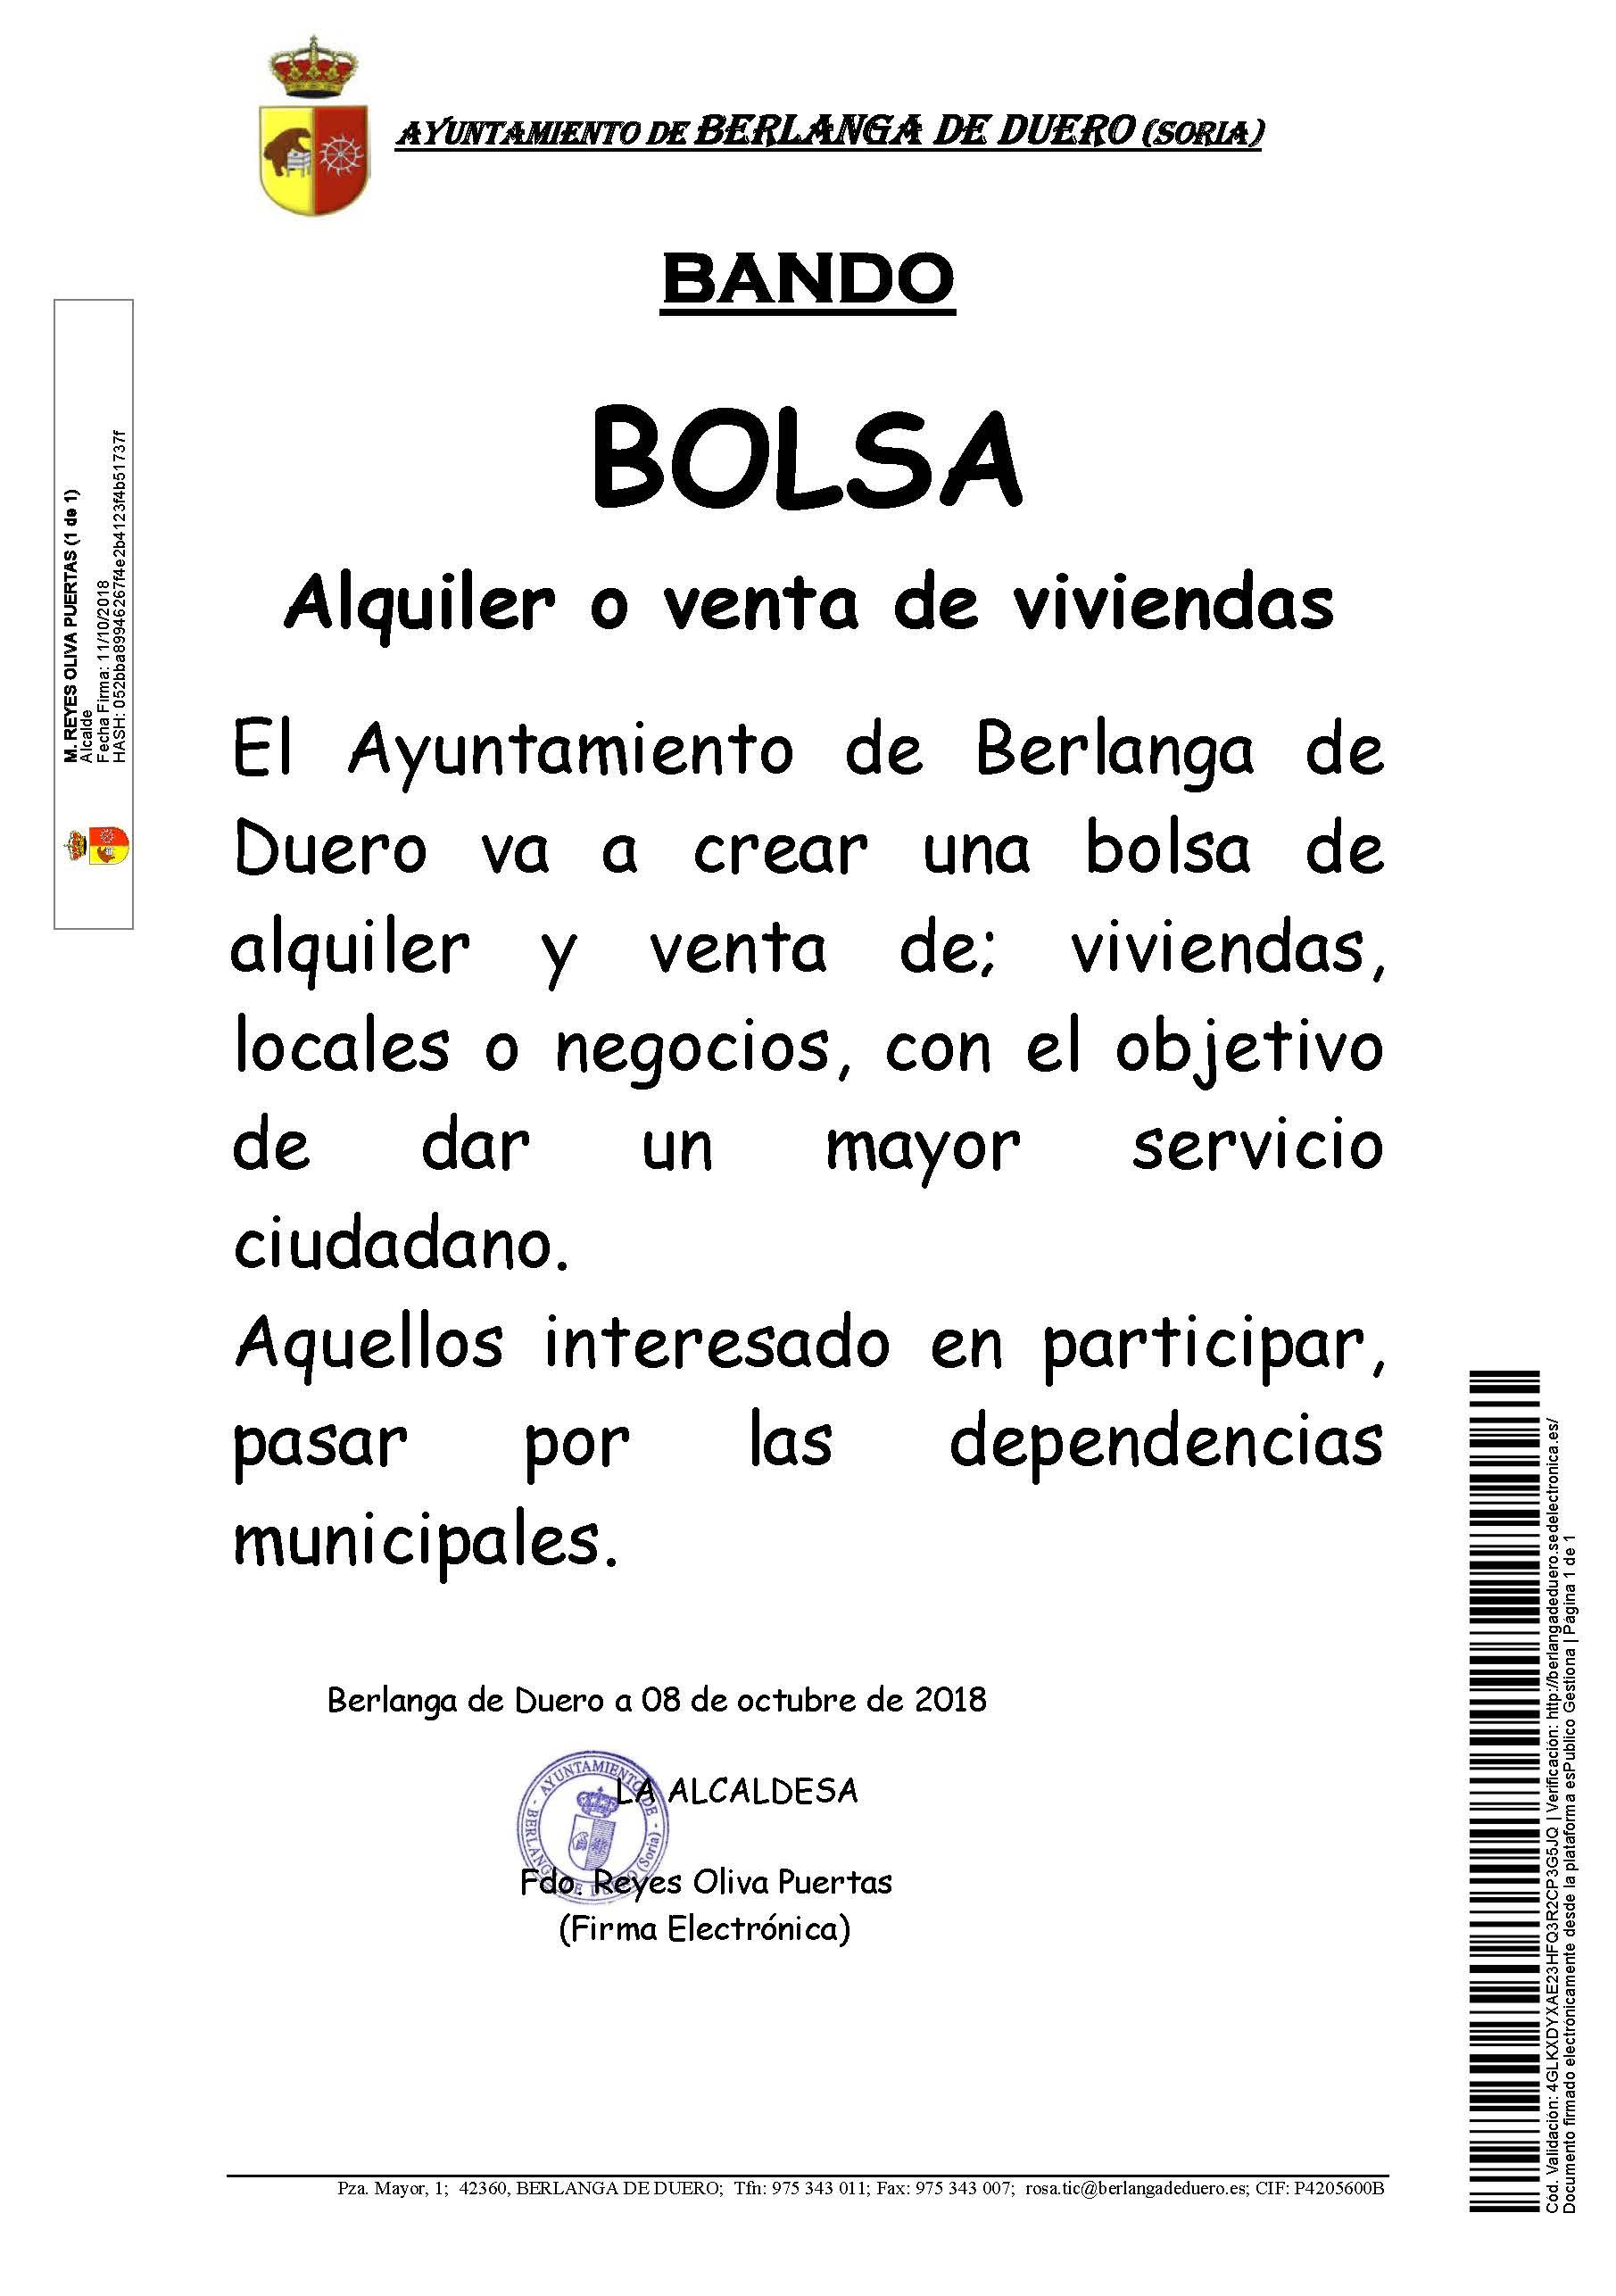 Bolsa Alquiler O Venta De Viviendas Ayuntamiento De Berlanga De Duero